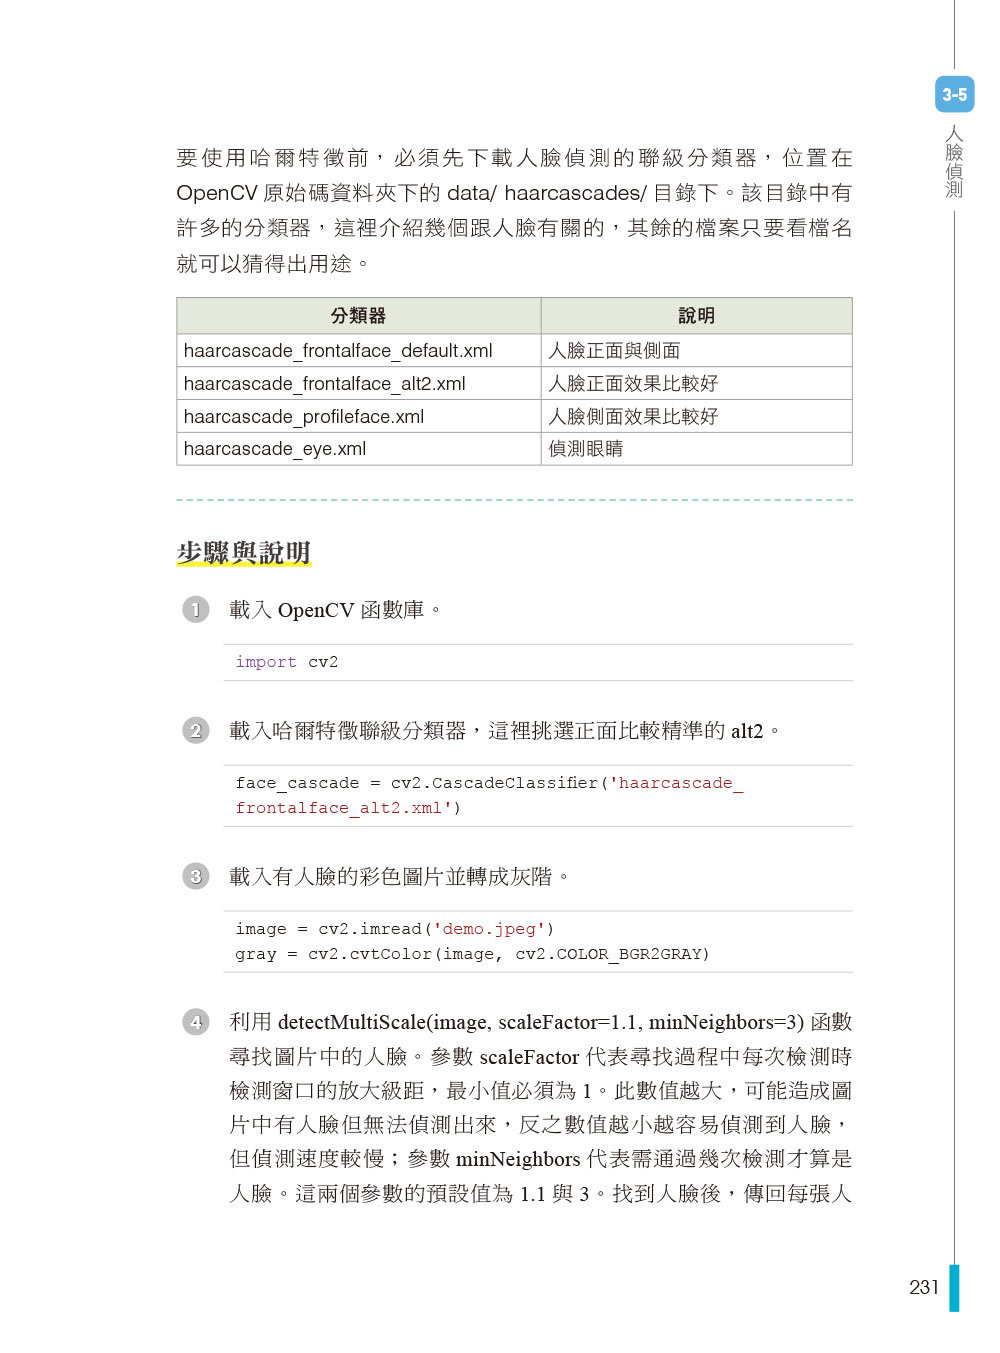 AIOT 與 OpenCV 實戰應用:Python、樹莓派、物聯網與機器視覺, 2/e-preview-3